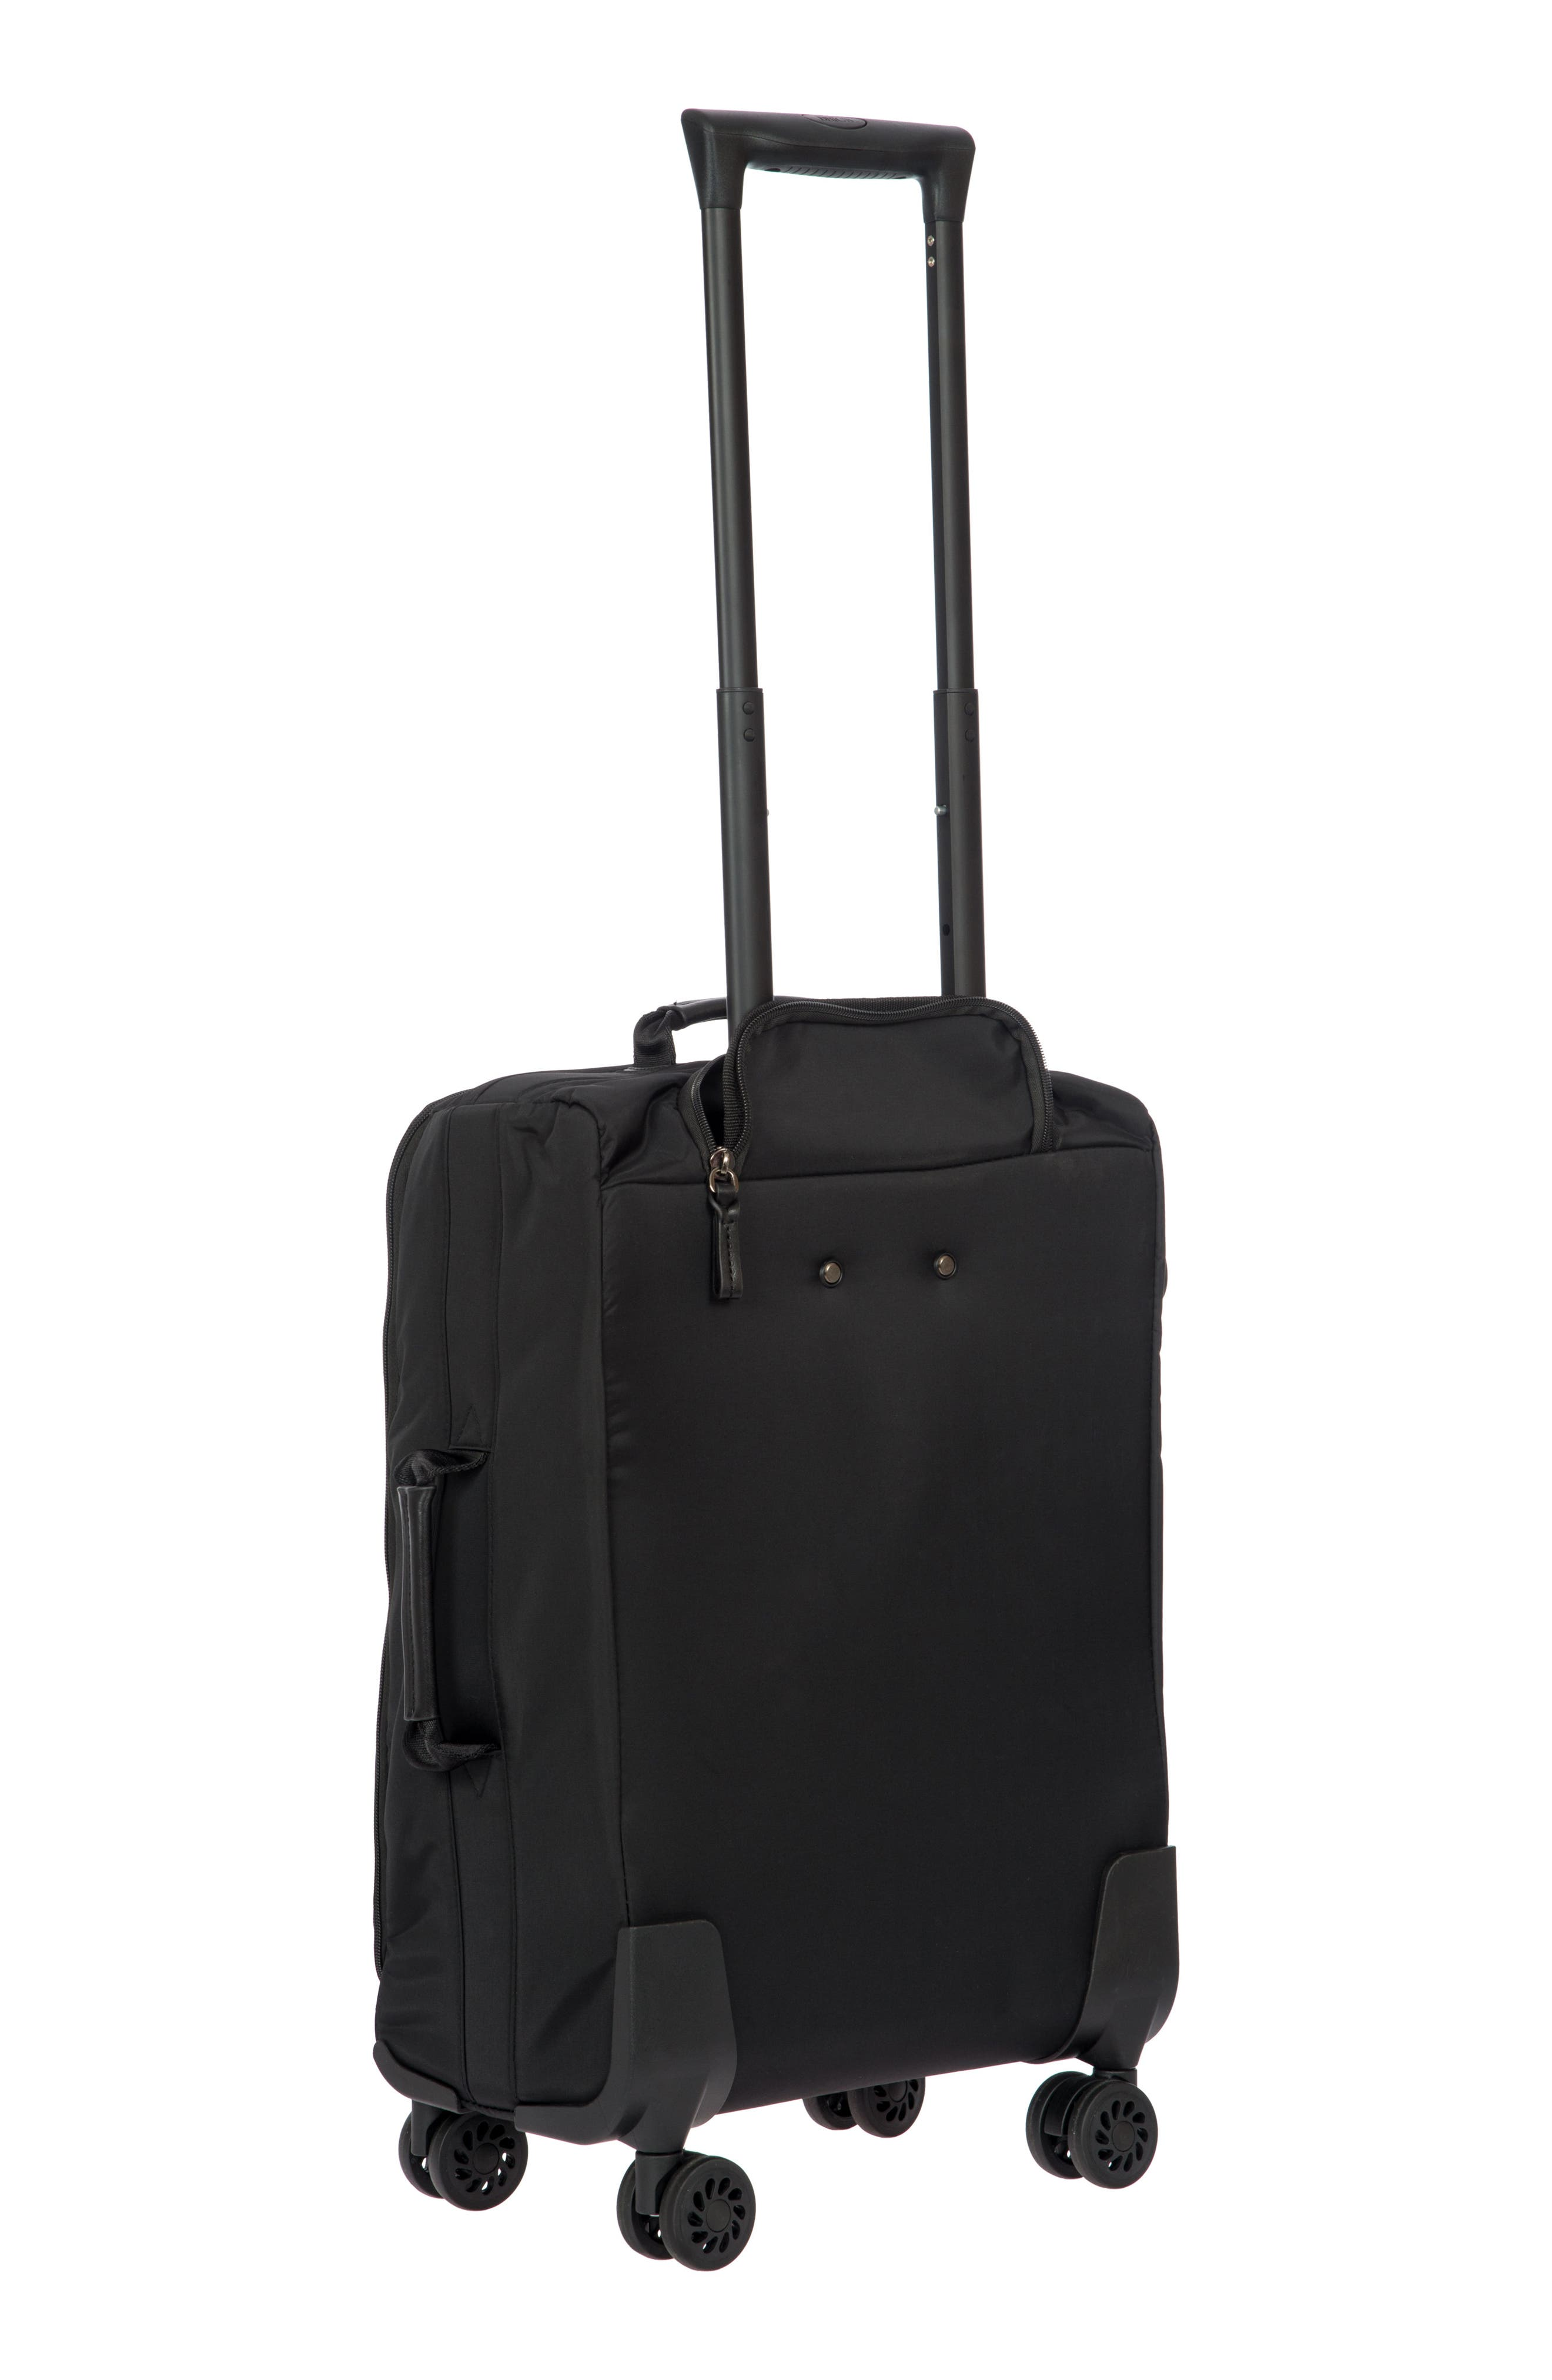 X-Bag 21-Inch Spinner Carry-On,                             Alternate thumbnail 6, color,                             Black/ Black